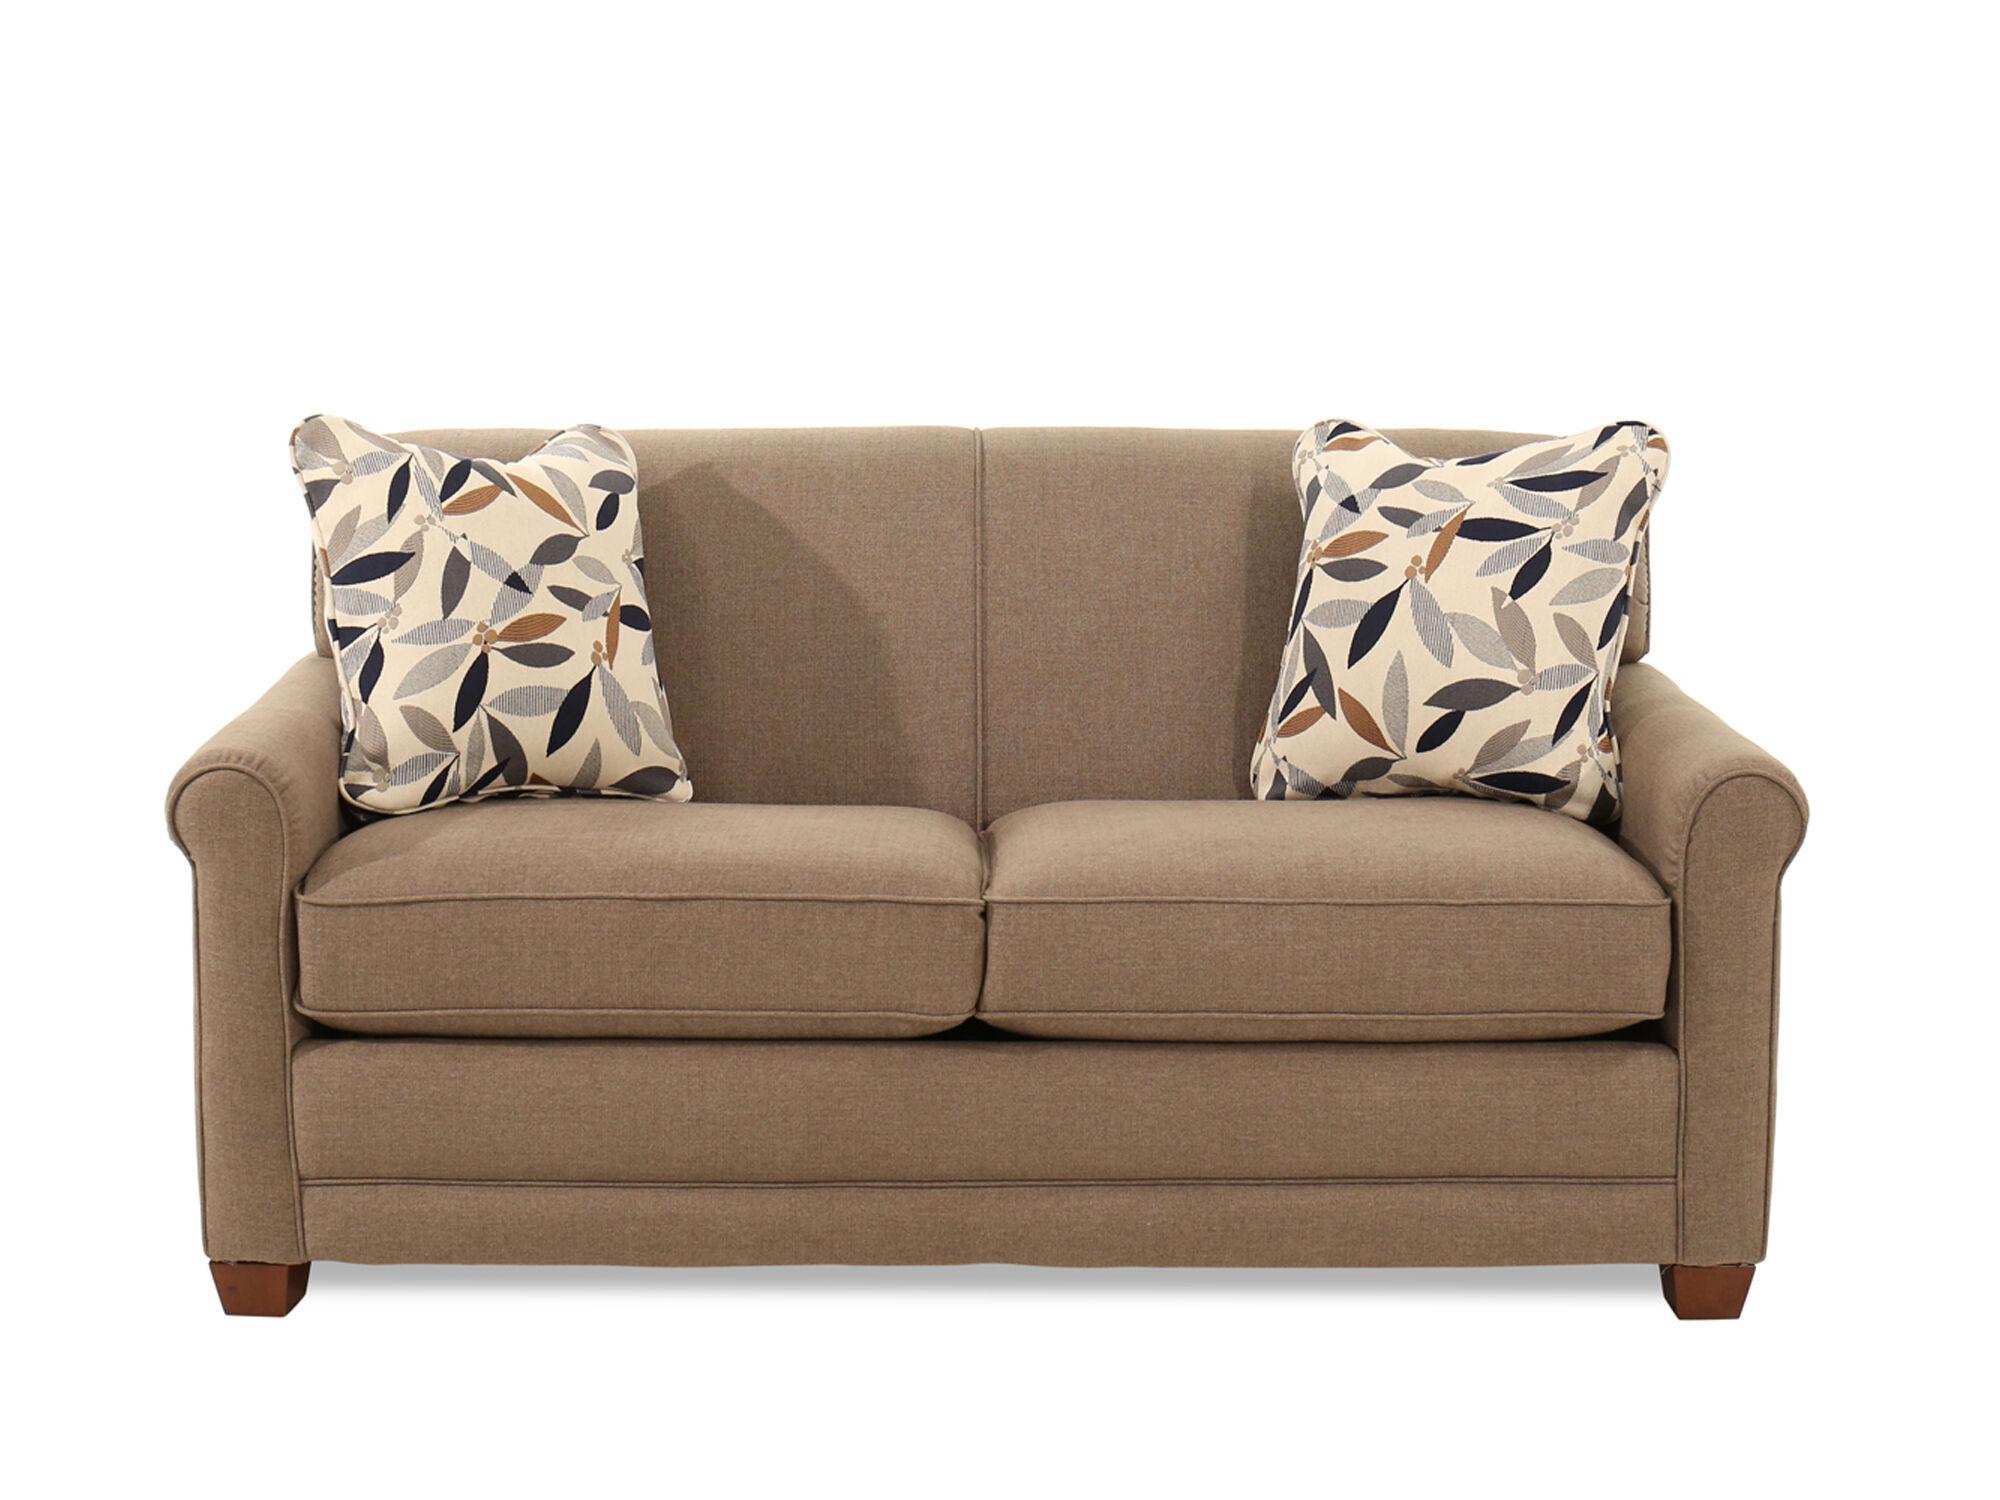 LaZBoy Premier Supreme Comfort Full Sleeper Sofa Mathis